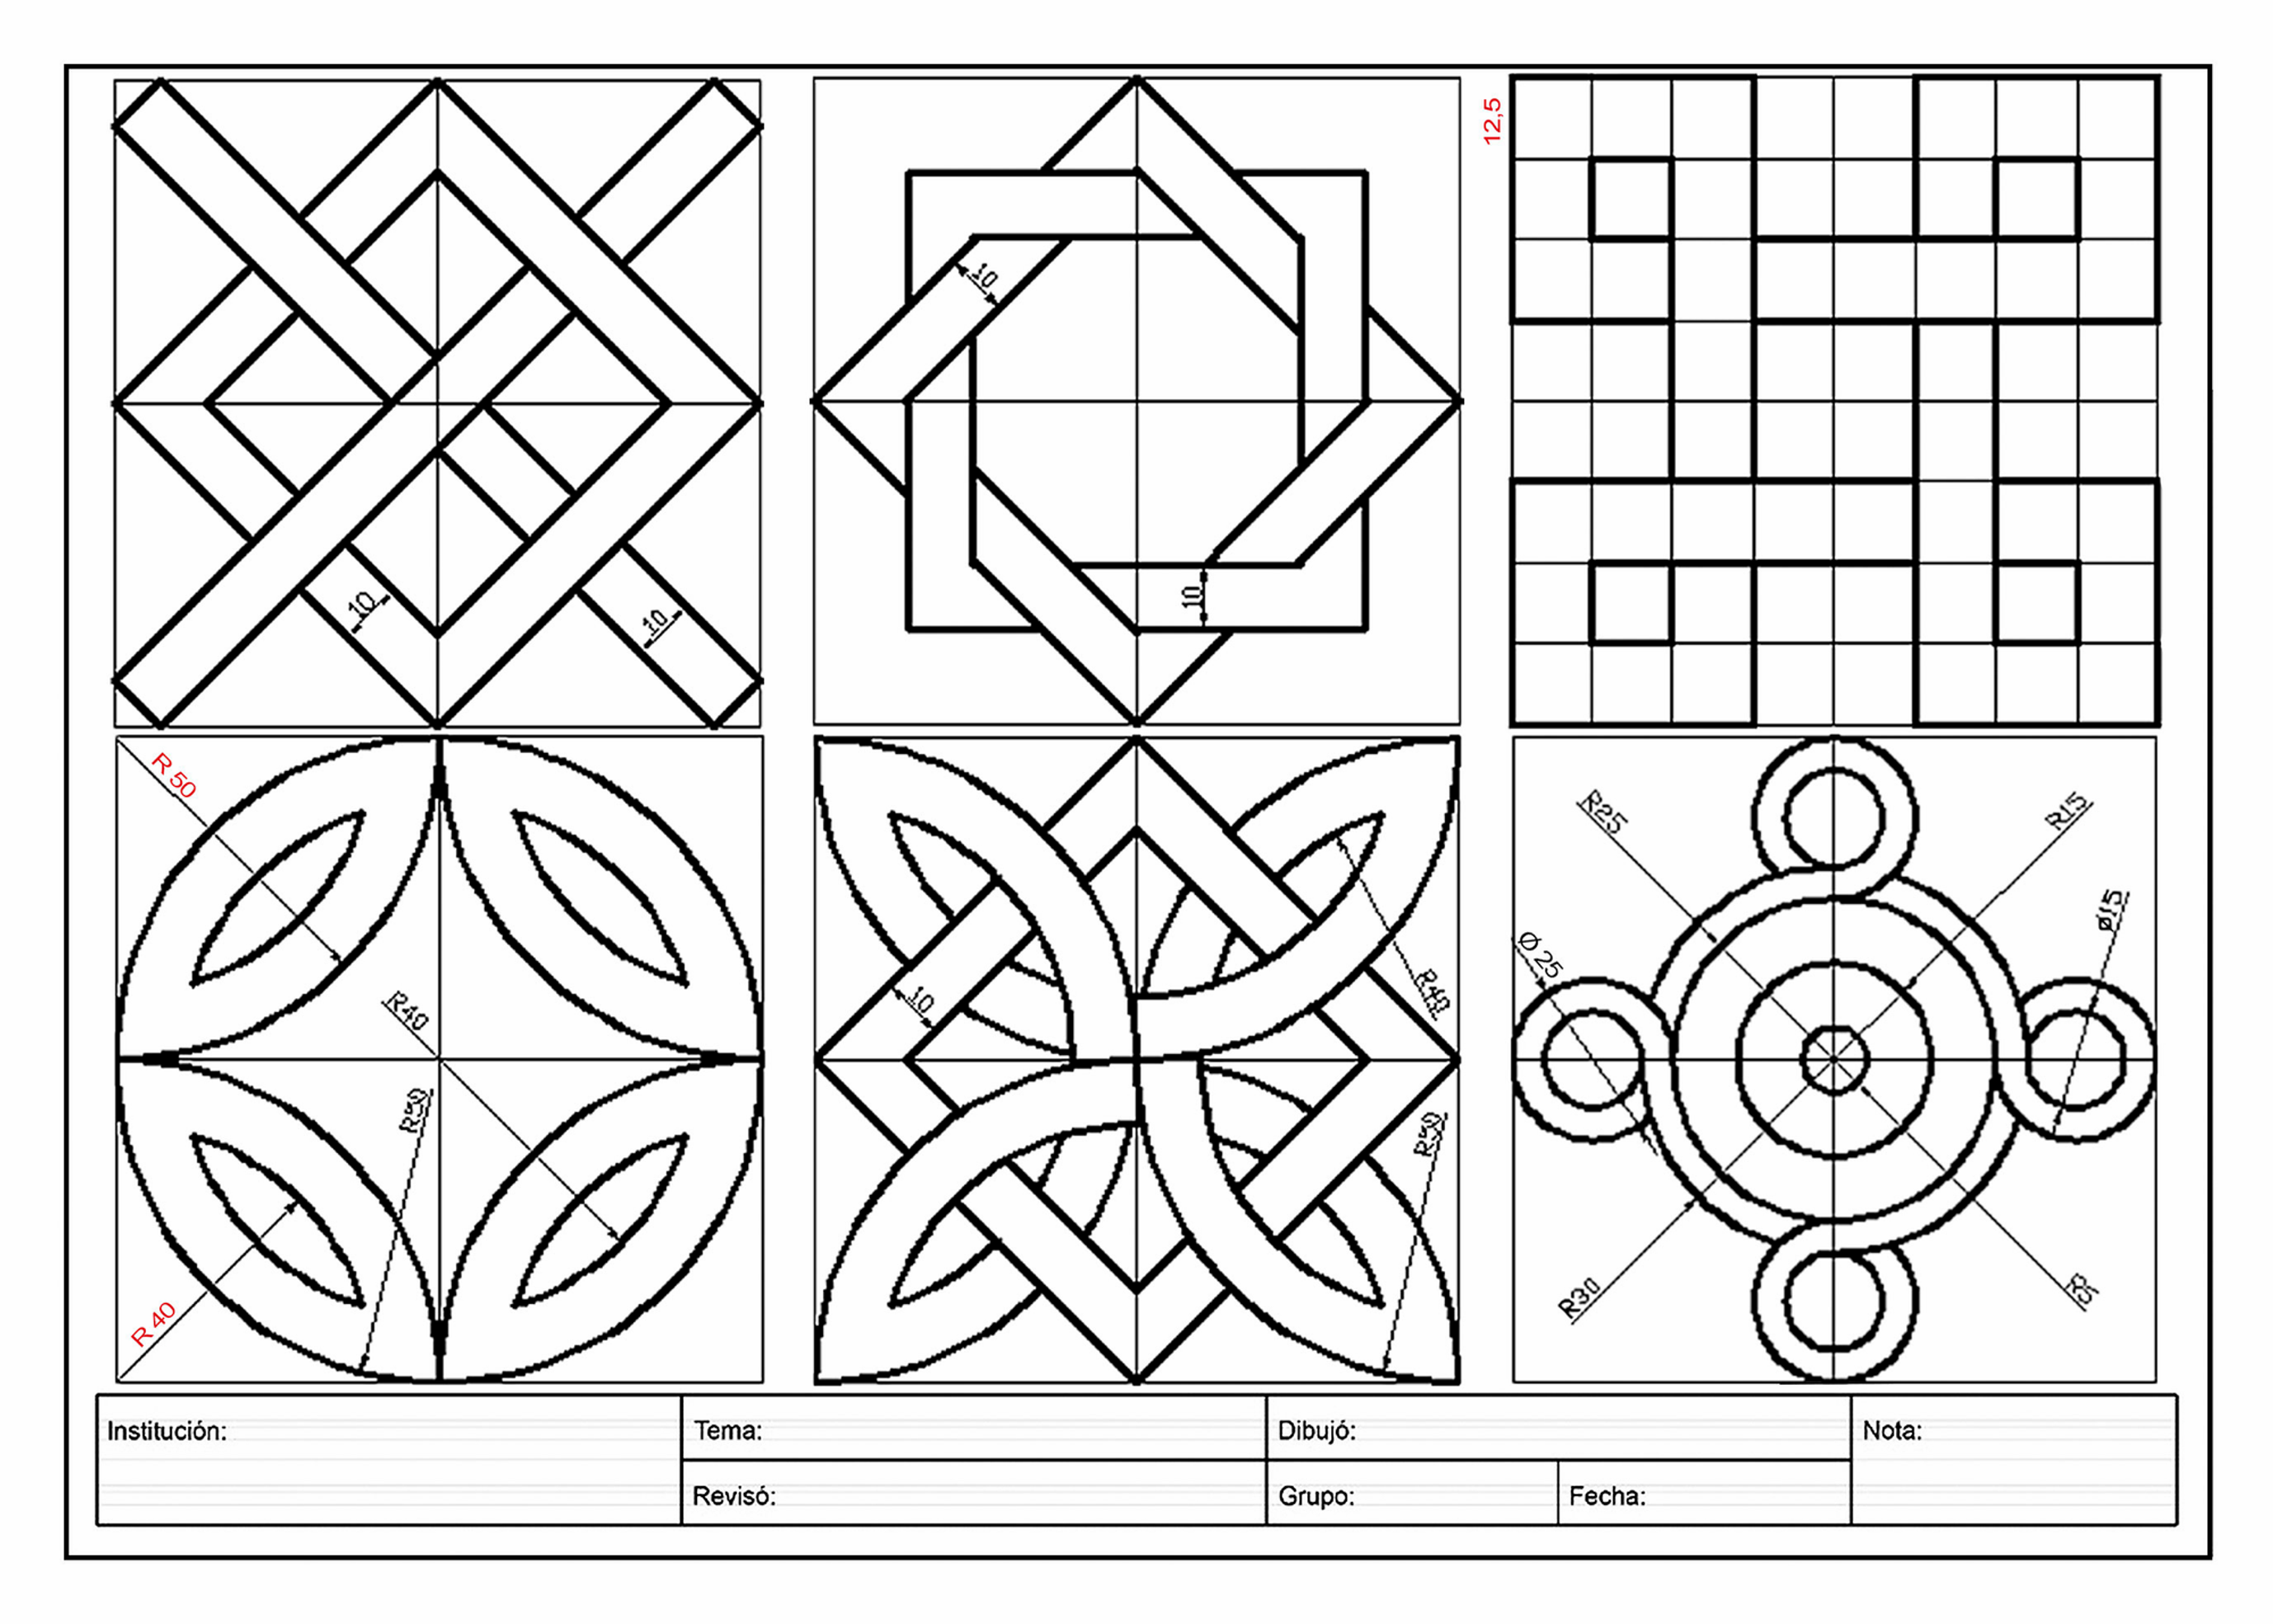 Educacion Artistica Grado 8 1 Tecnicas De Dibujo Dibujo Con Lineas Artistas